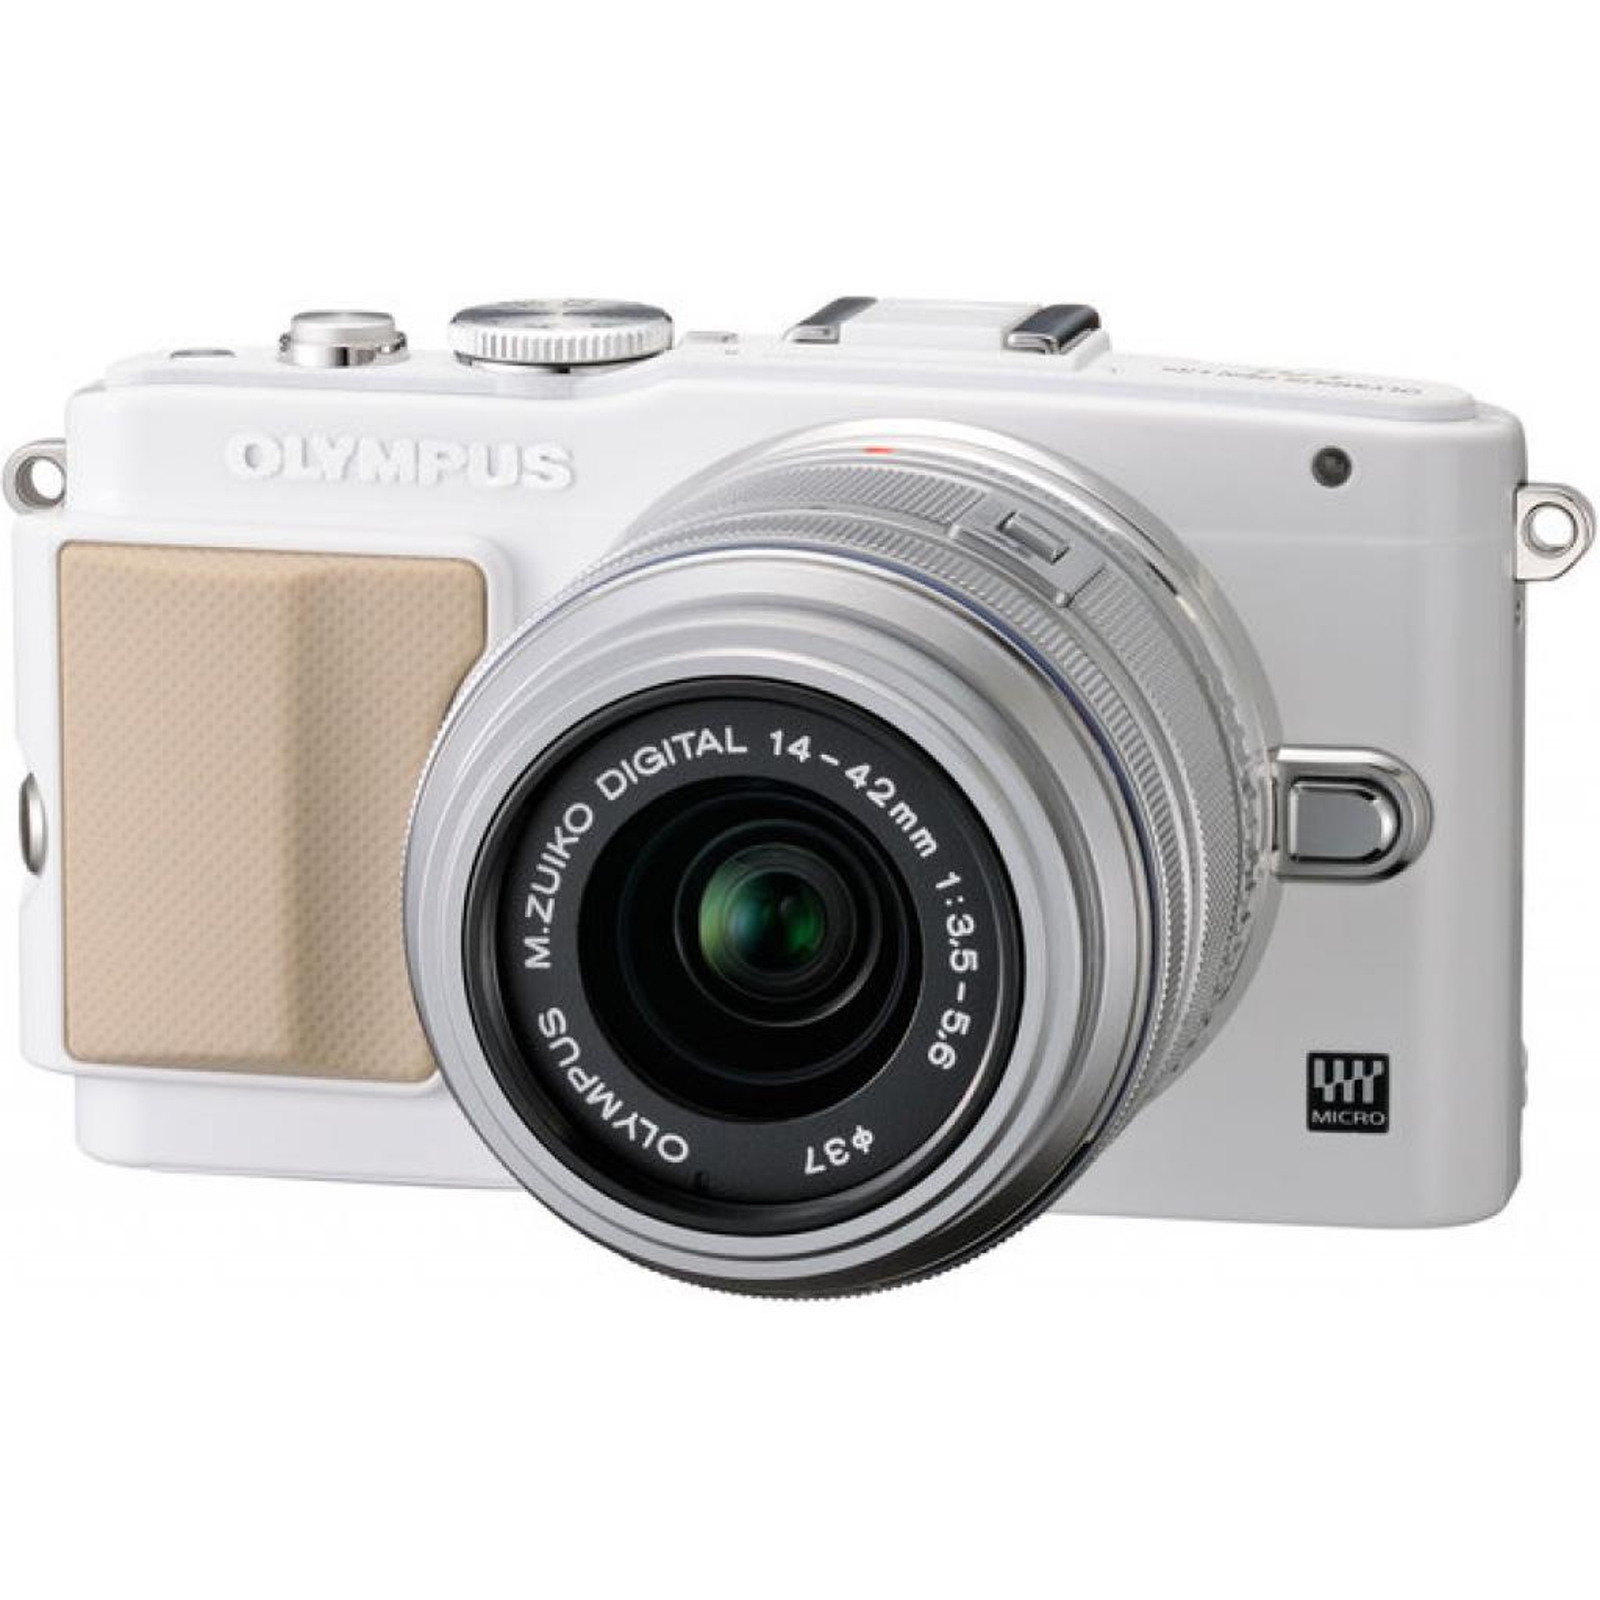 Цифровой фотоаппарат OLYMPUS E-PL5 14-42 mm white/silver (V205041WE000) изображение 2